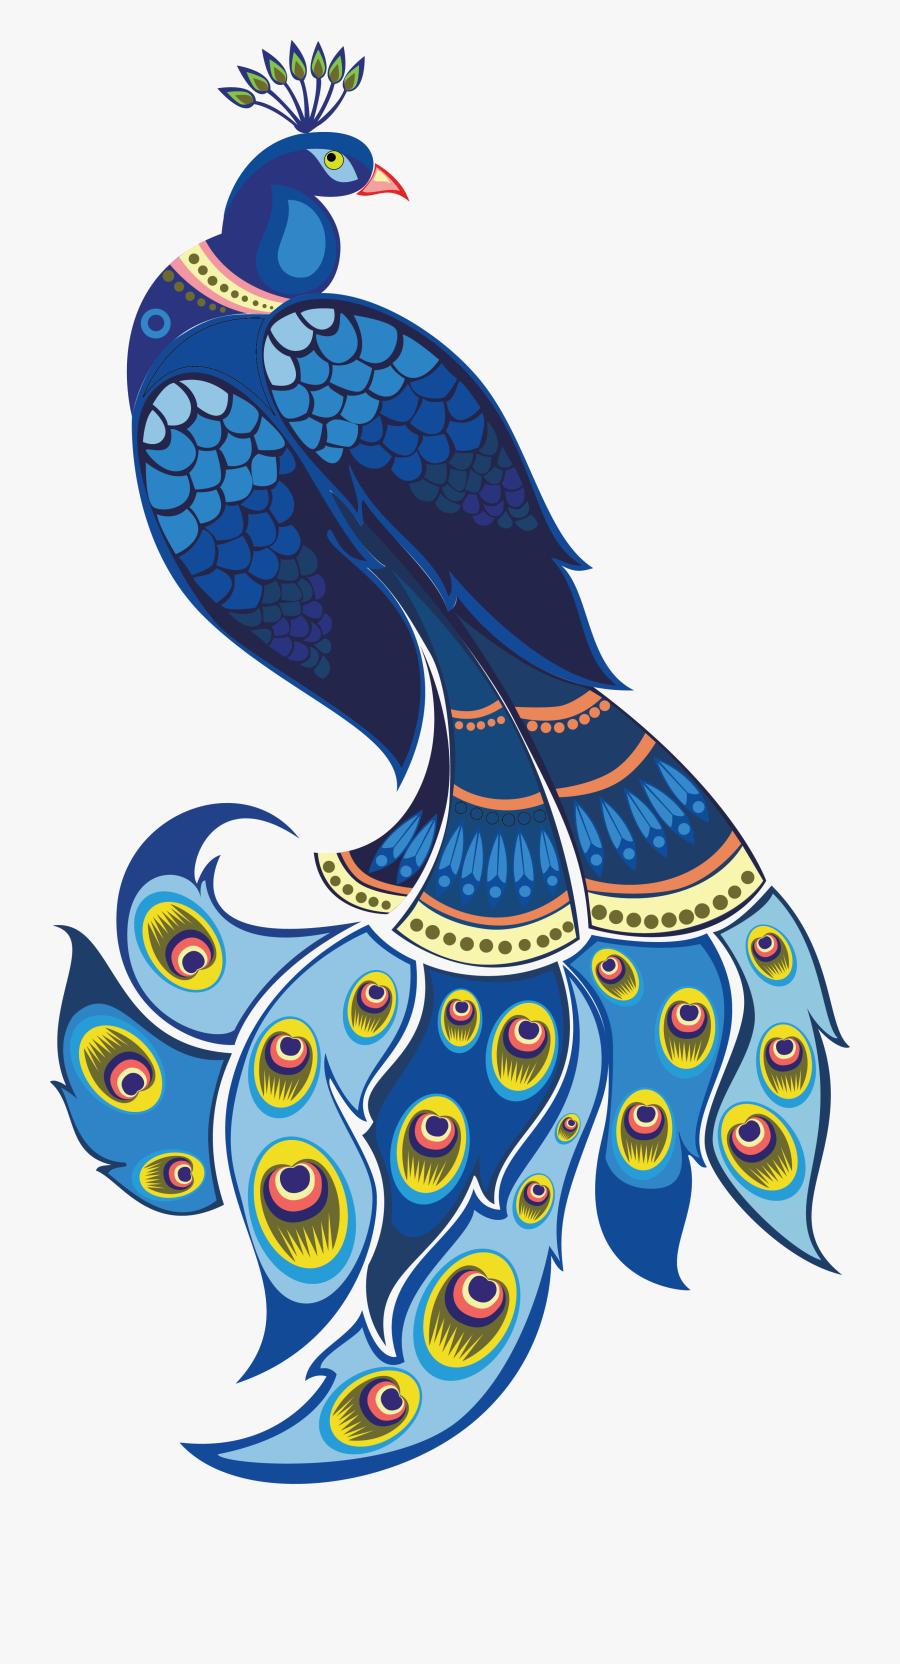 Transparent Hindu Png - Vector Transparent Peacock Png, Transparent Clipart